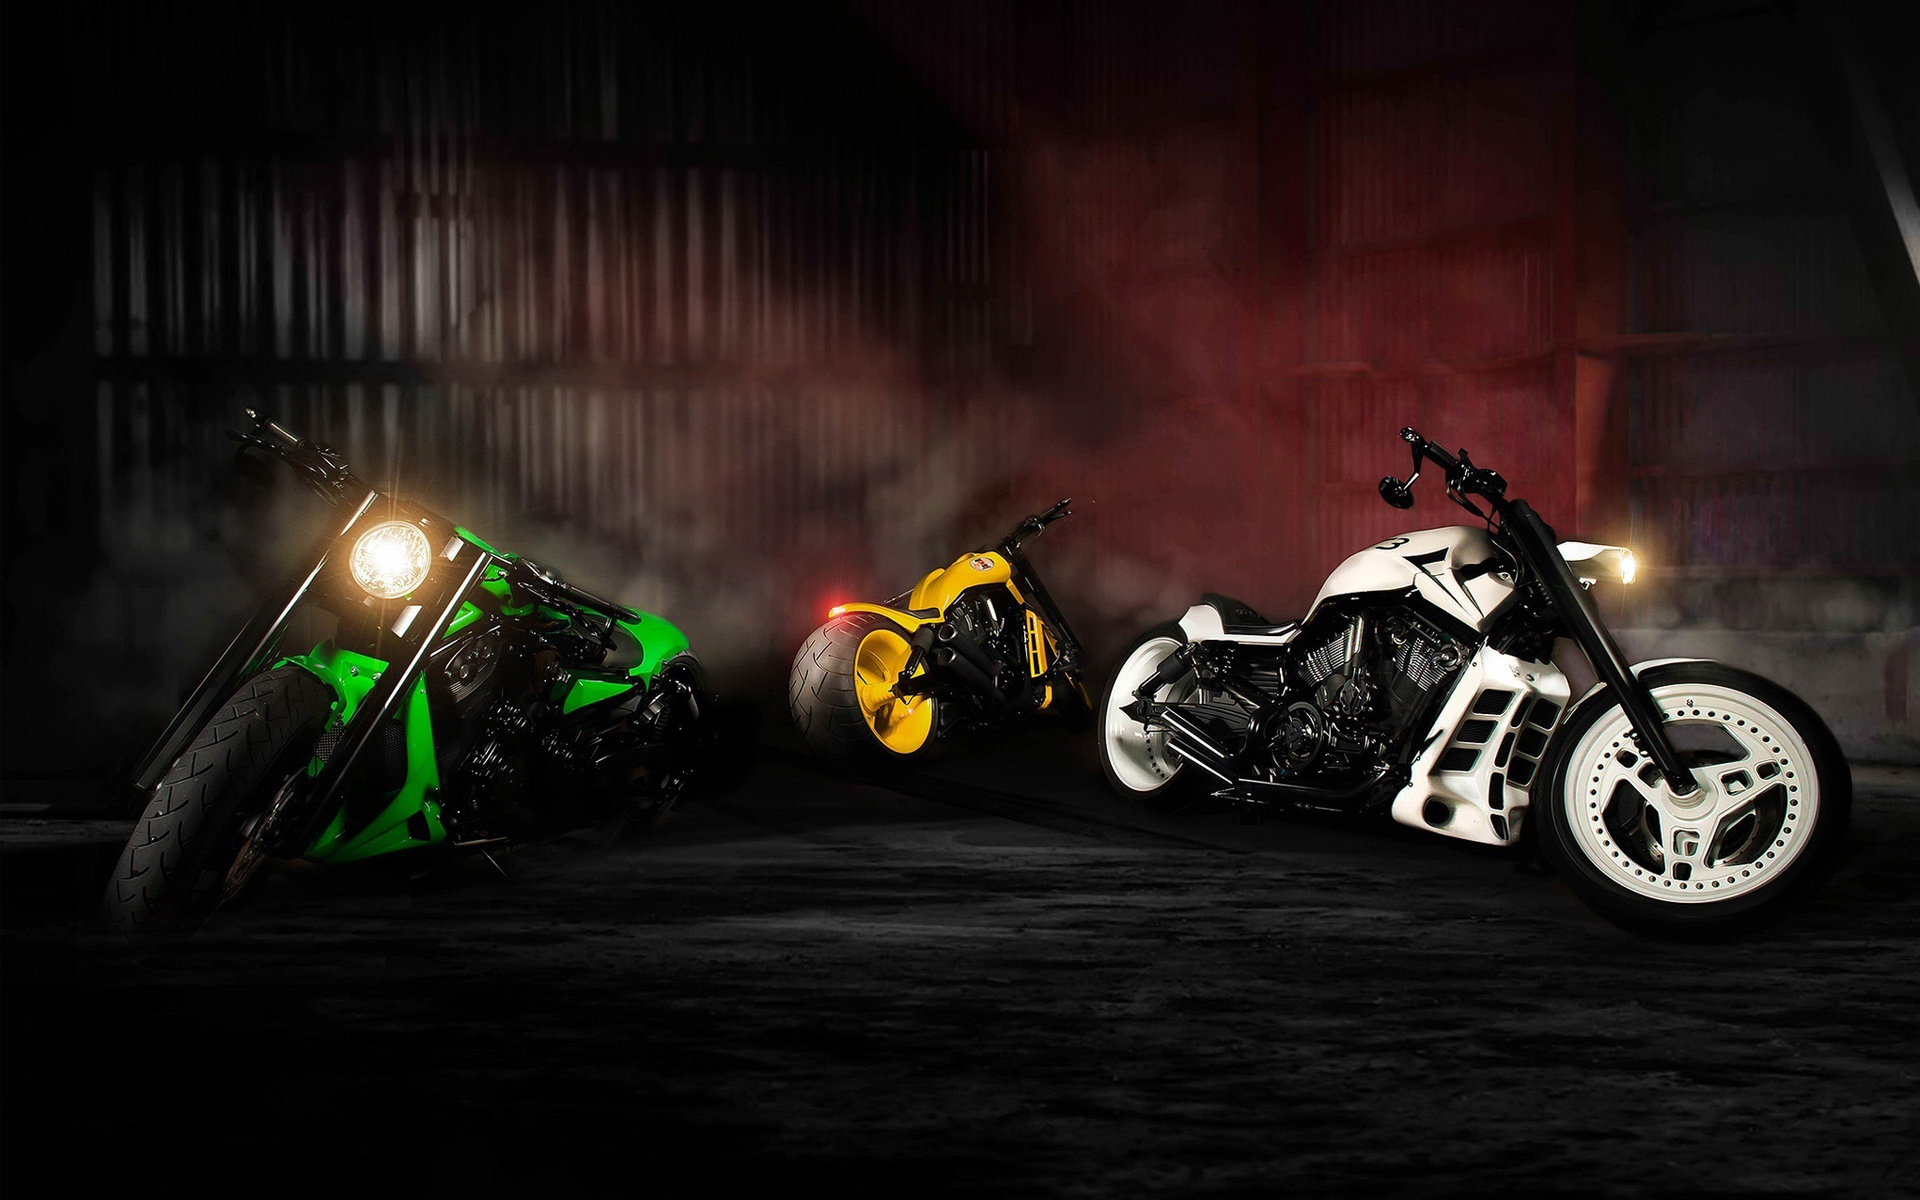 HD Motorcycle Wallpapers For Desktop  WallpaperSafari